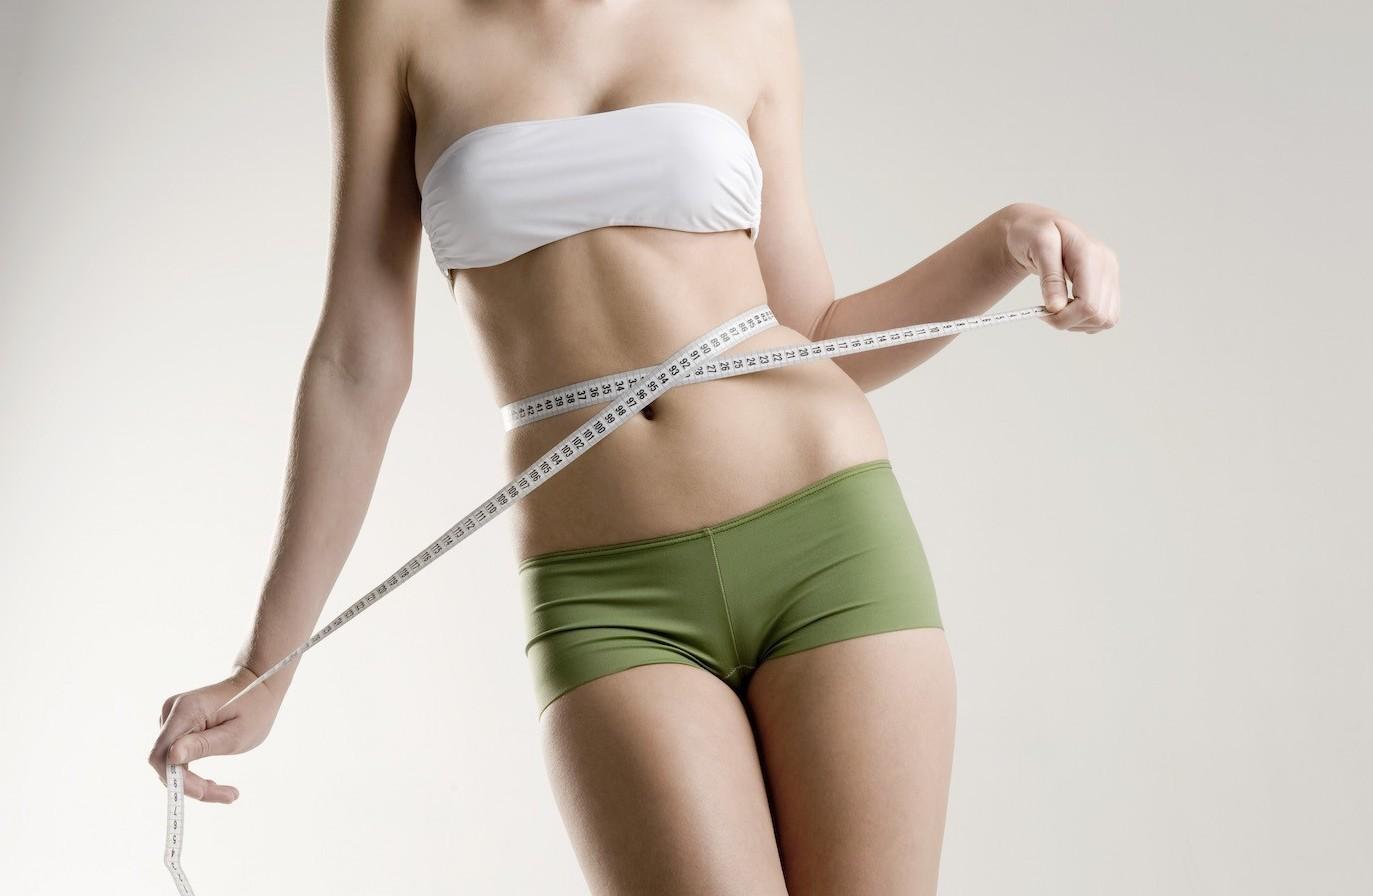 Dieta: pancia piatta, tonica e diminuire